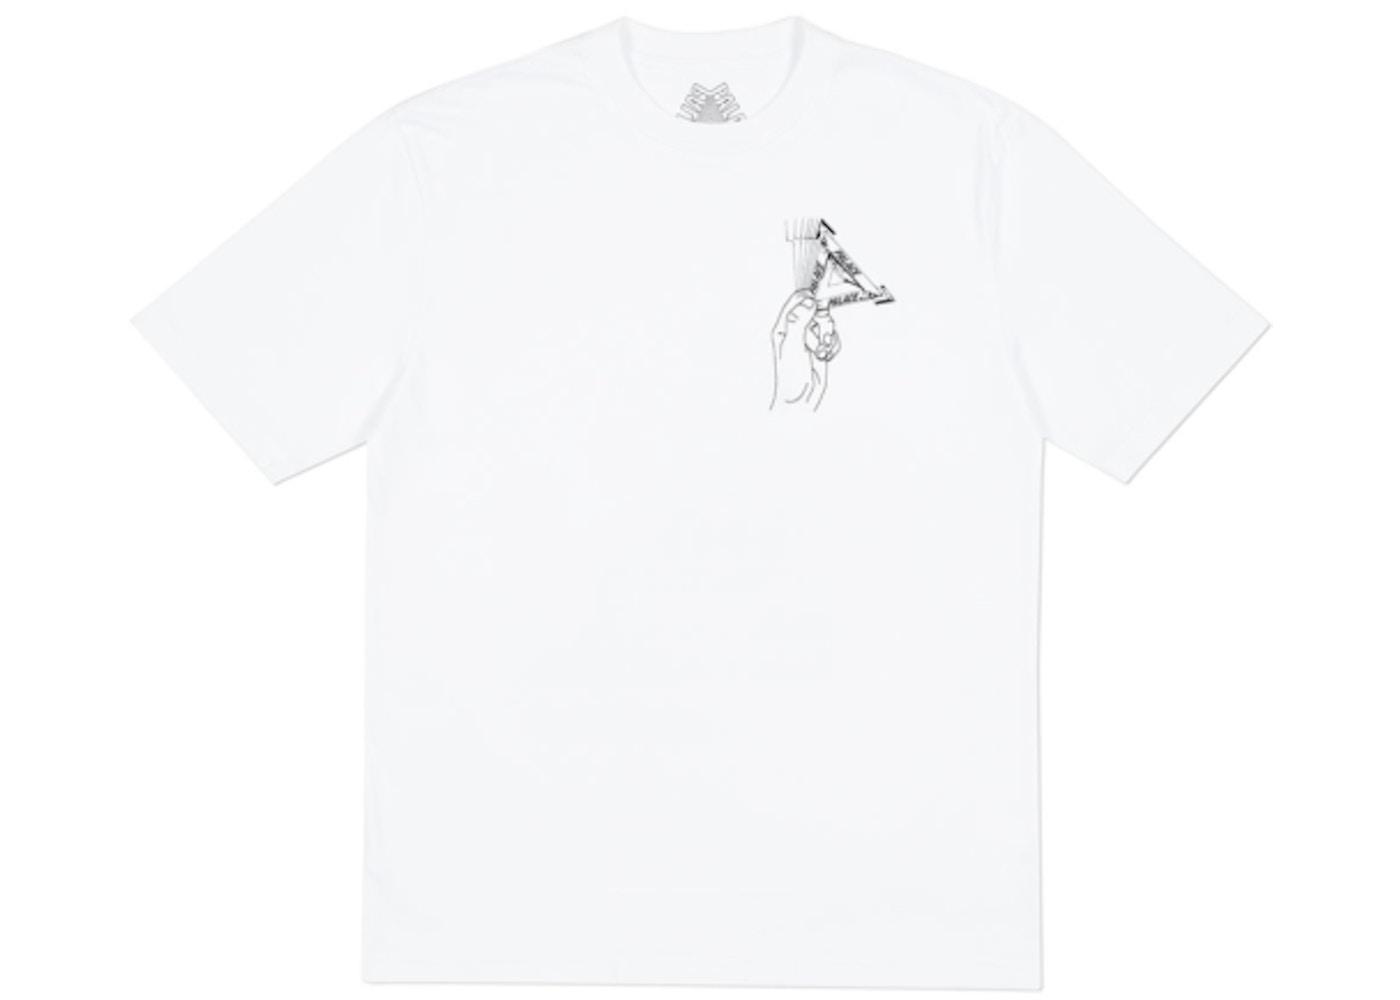 12a44ed9 Palace Grand Master T-Shirt White. Grand Master